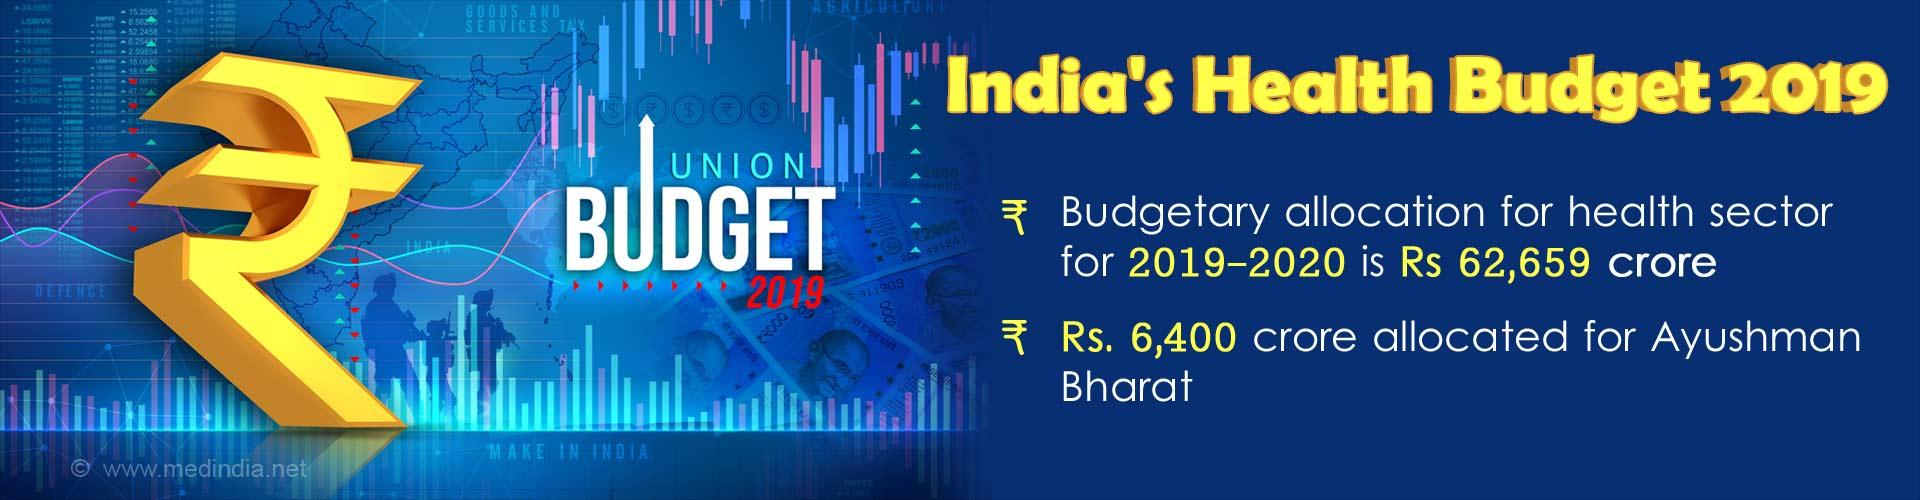 India - Budgetary Allocation for Health 2019